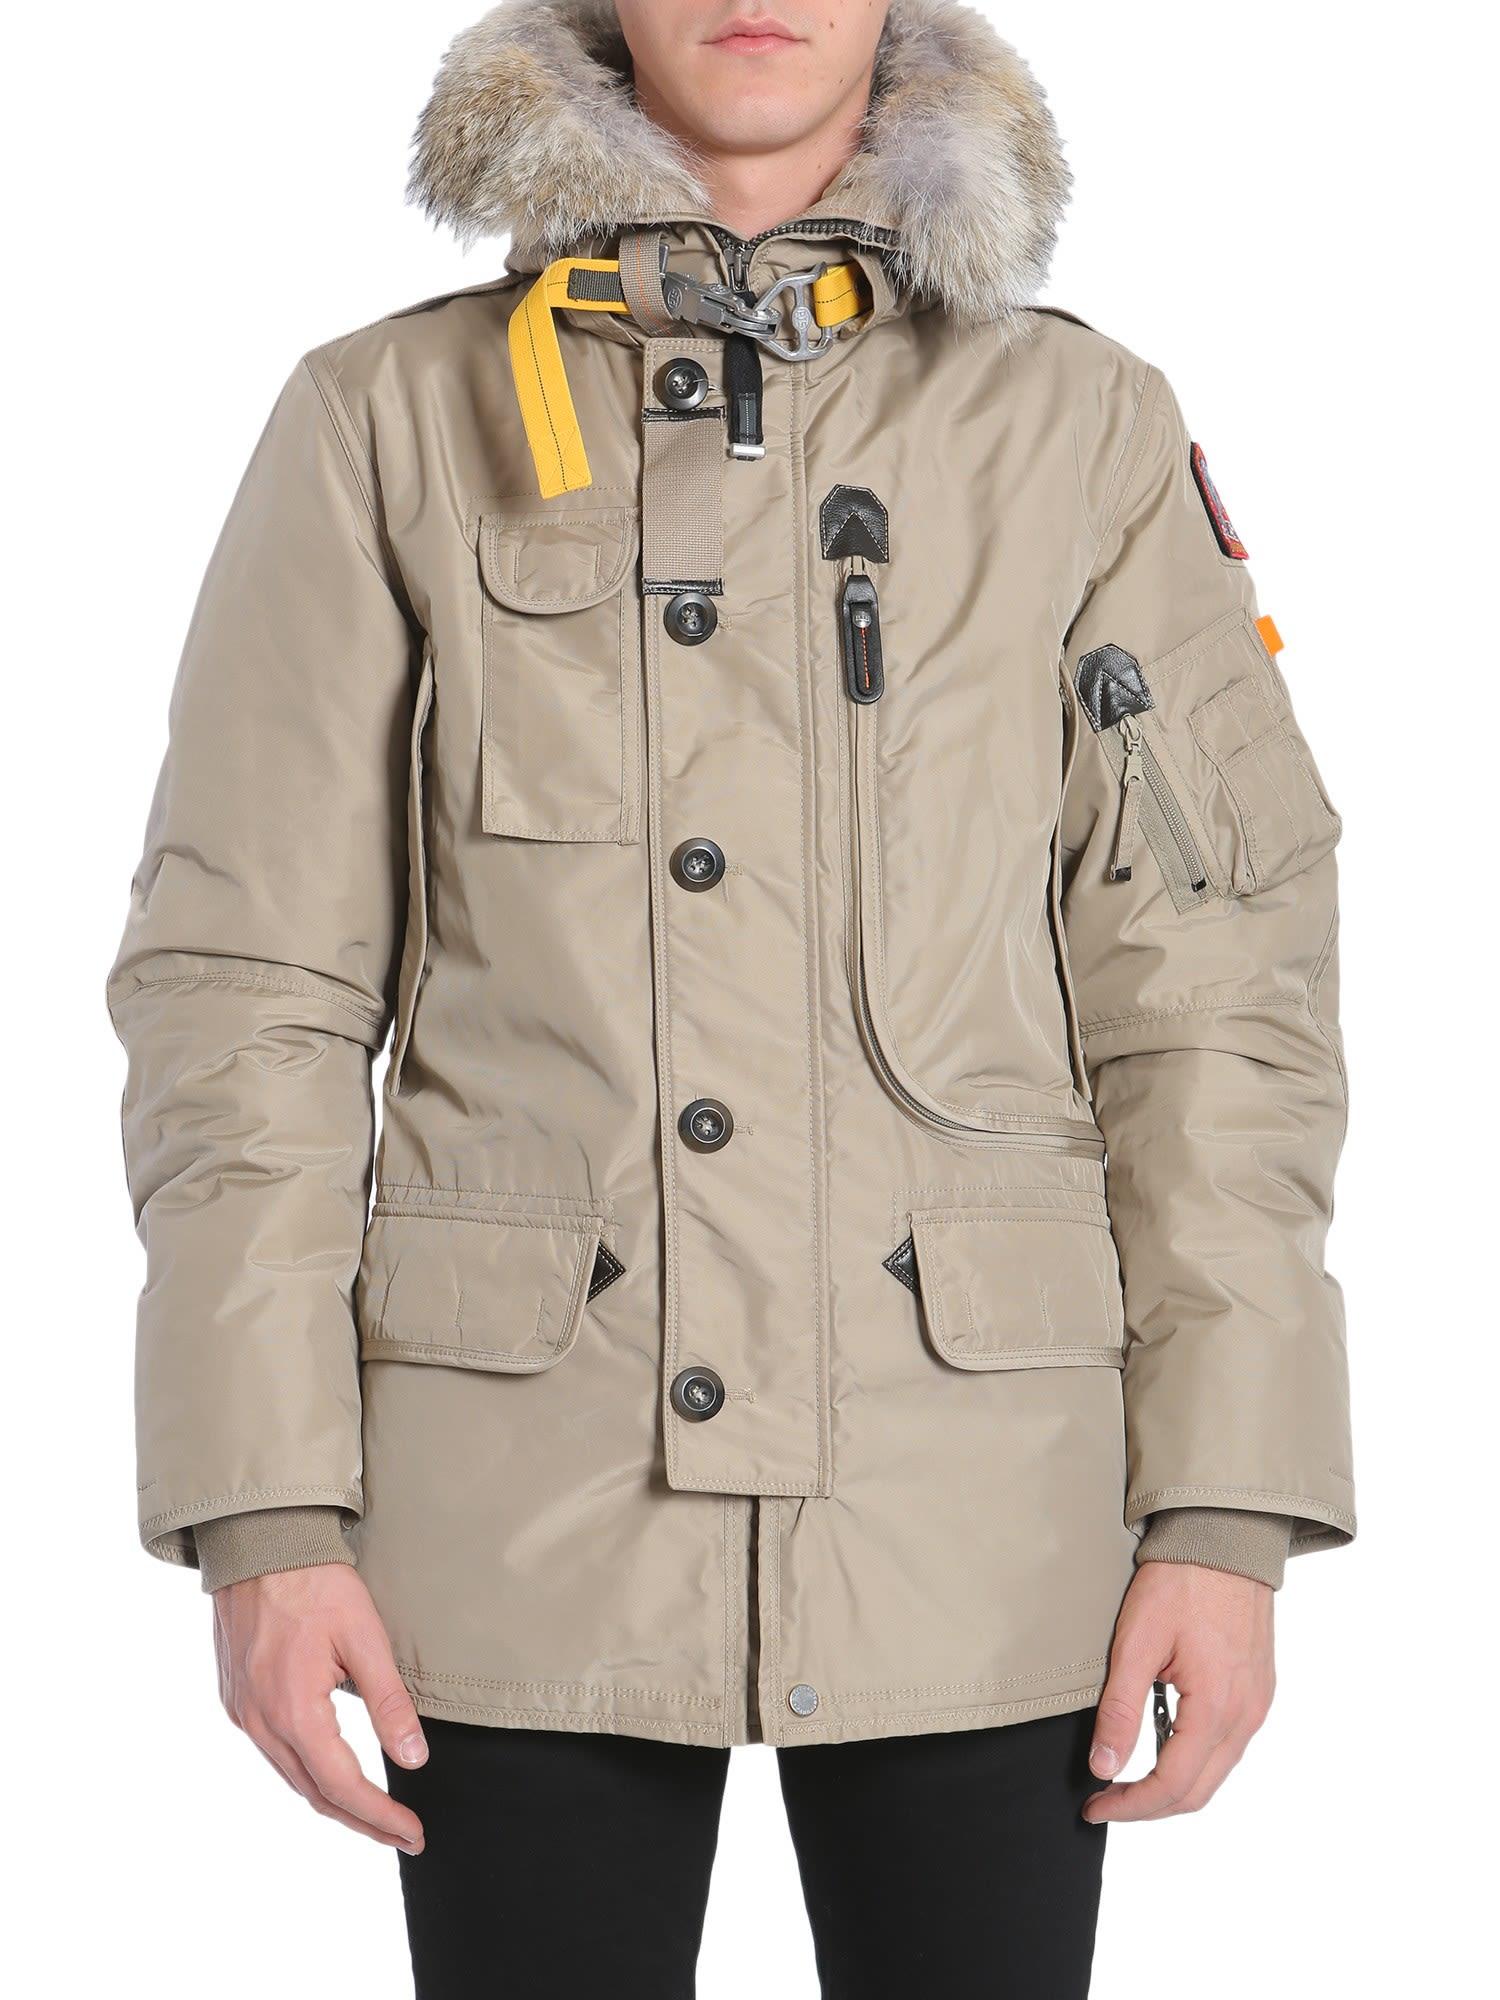 Kodiak Down Jacket